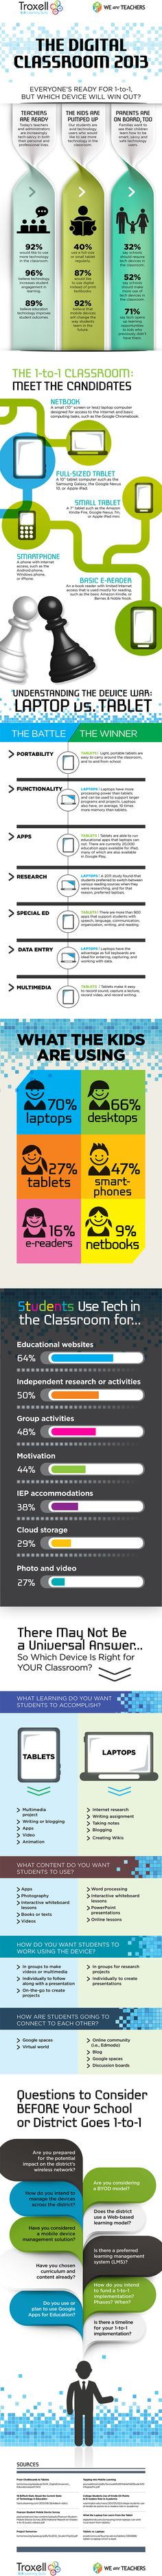 The Digital #Classroom 2013 #edtech #education #eLearning